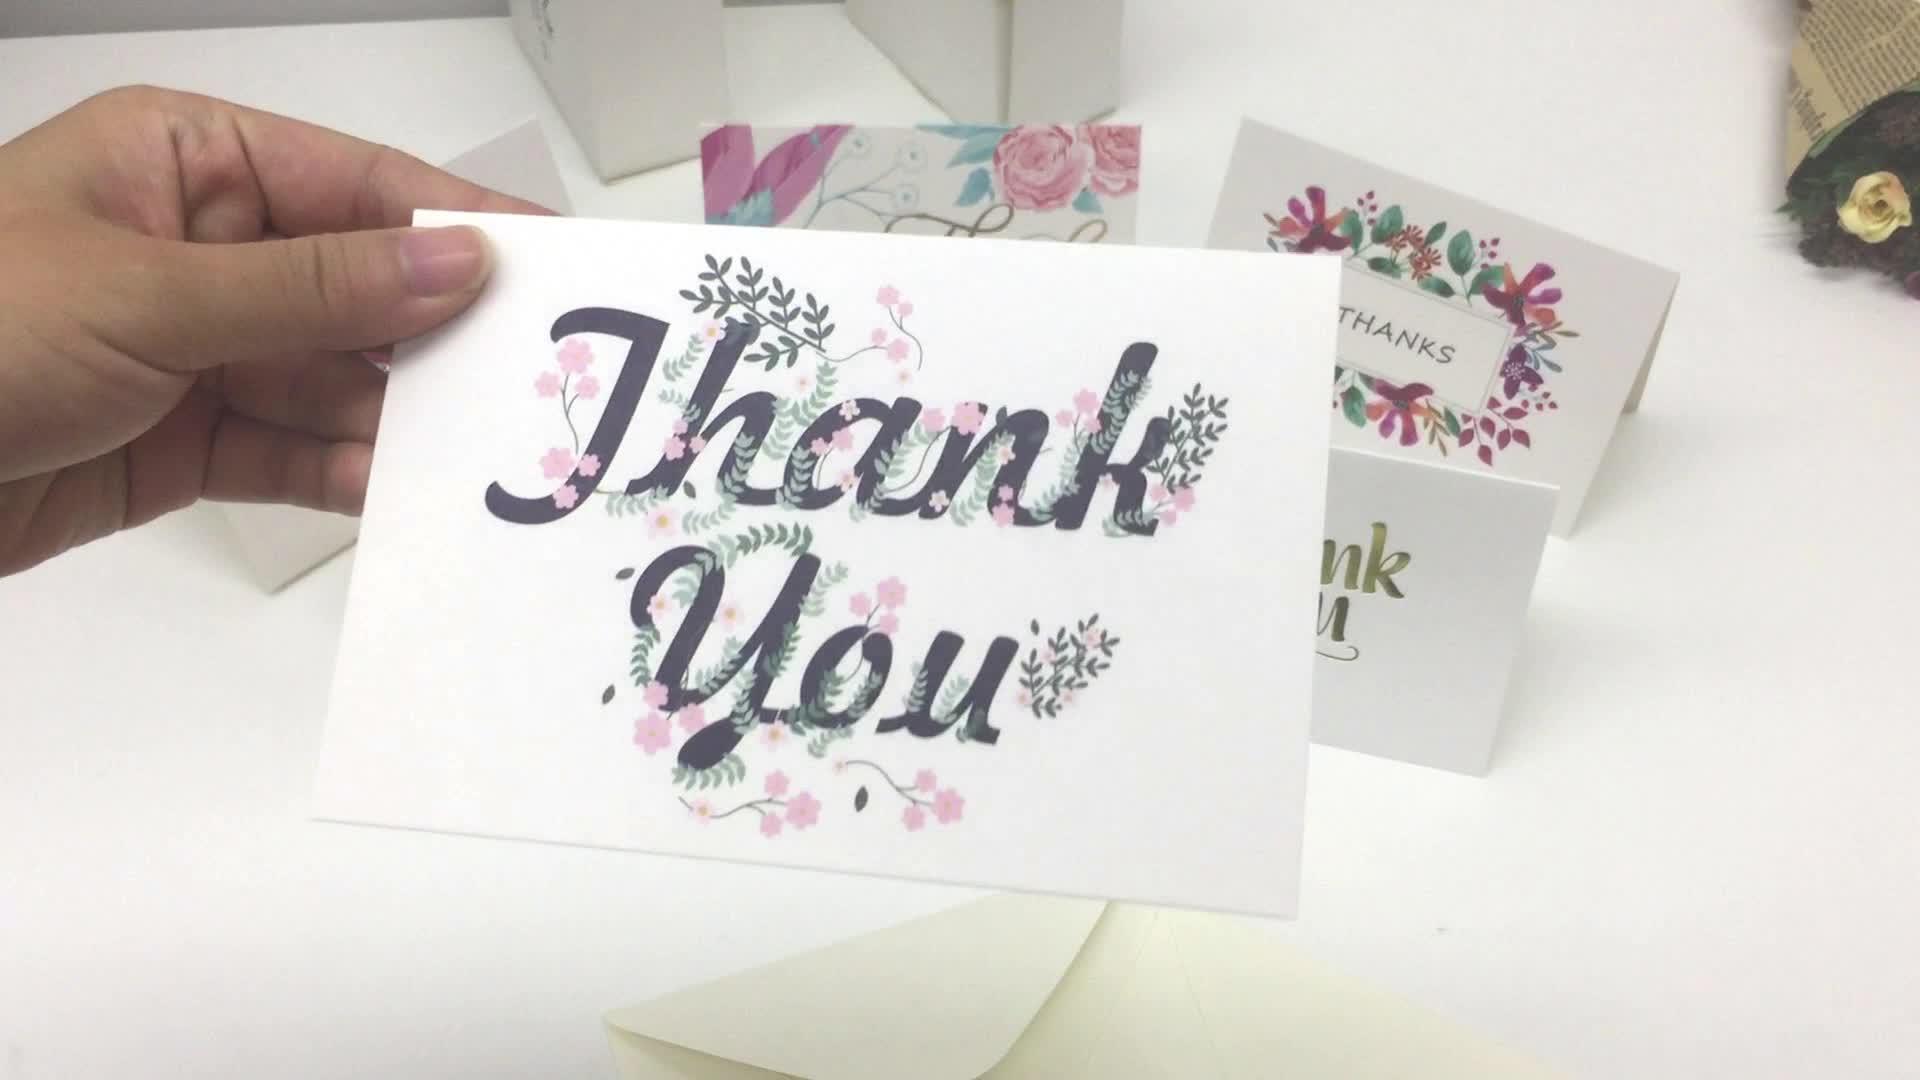 100 STÜCKE 48 STÜCKE 36 STÜCKE Beliebte Alles Gute Zum Geburtstag Grußkarte Danke Grußkarte